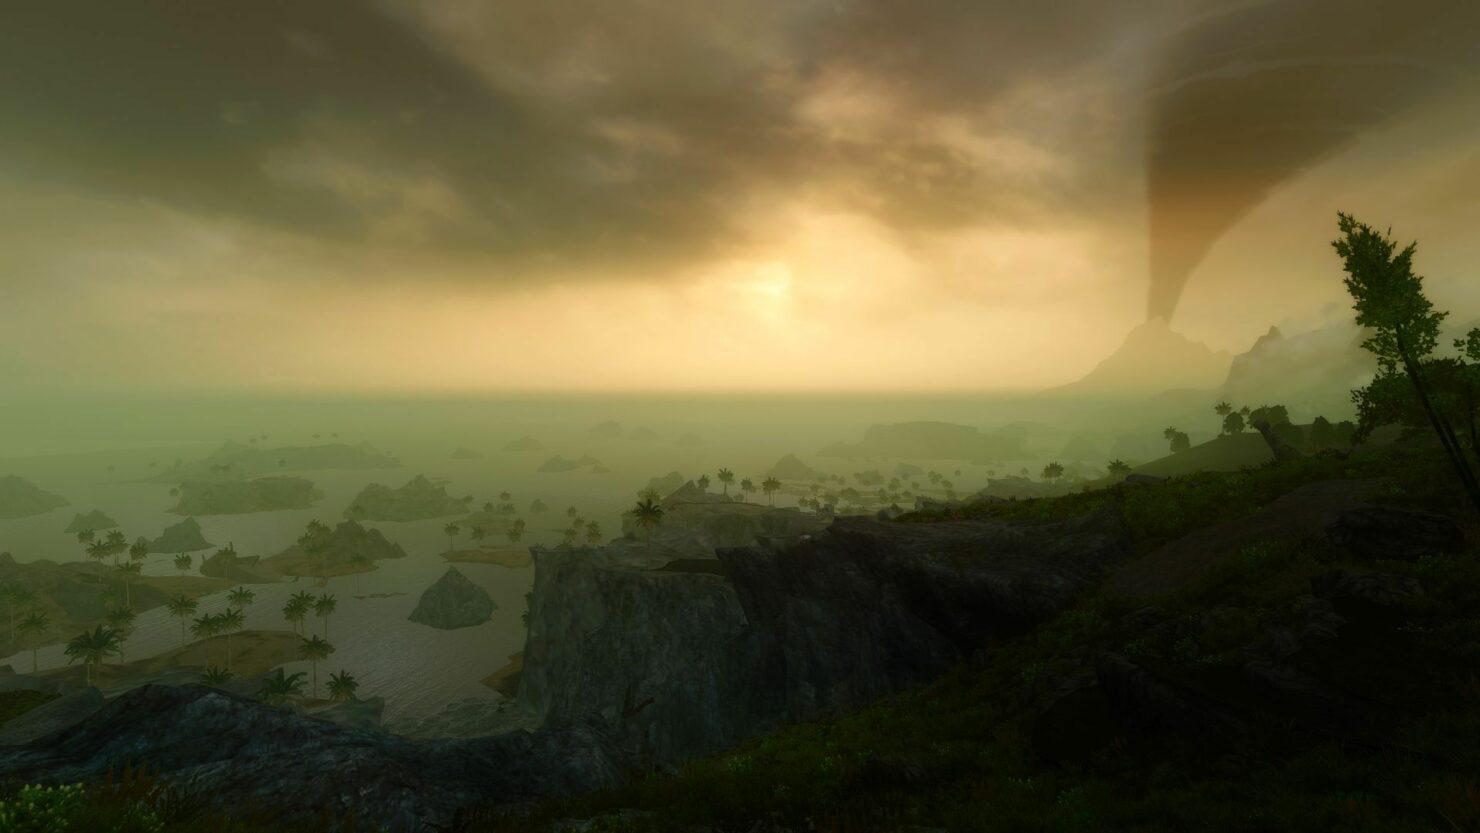 elder-scrolls-v-skyrim-legendary-edition-project-rainforest-mod-update-9